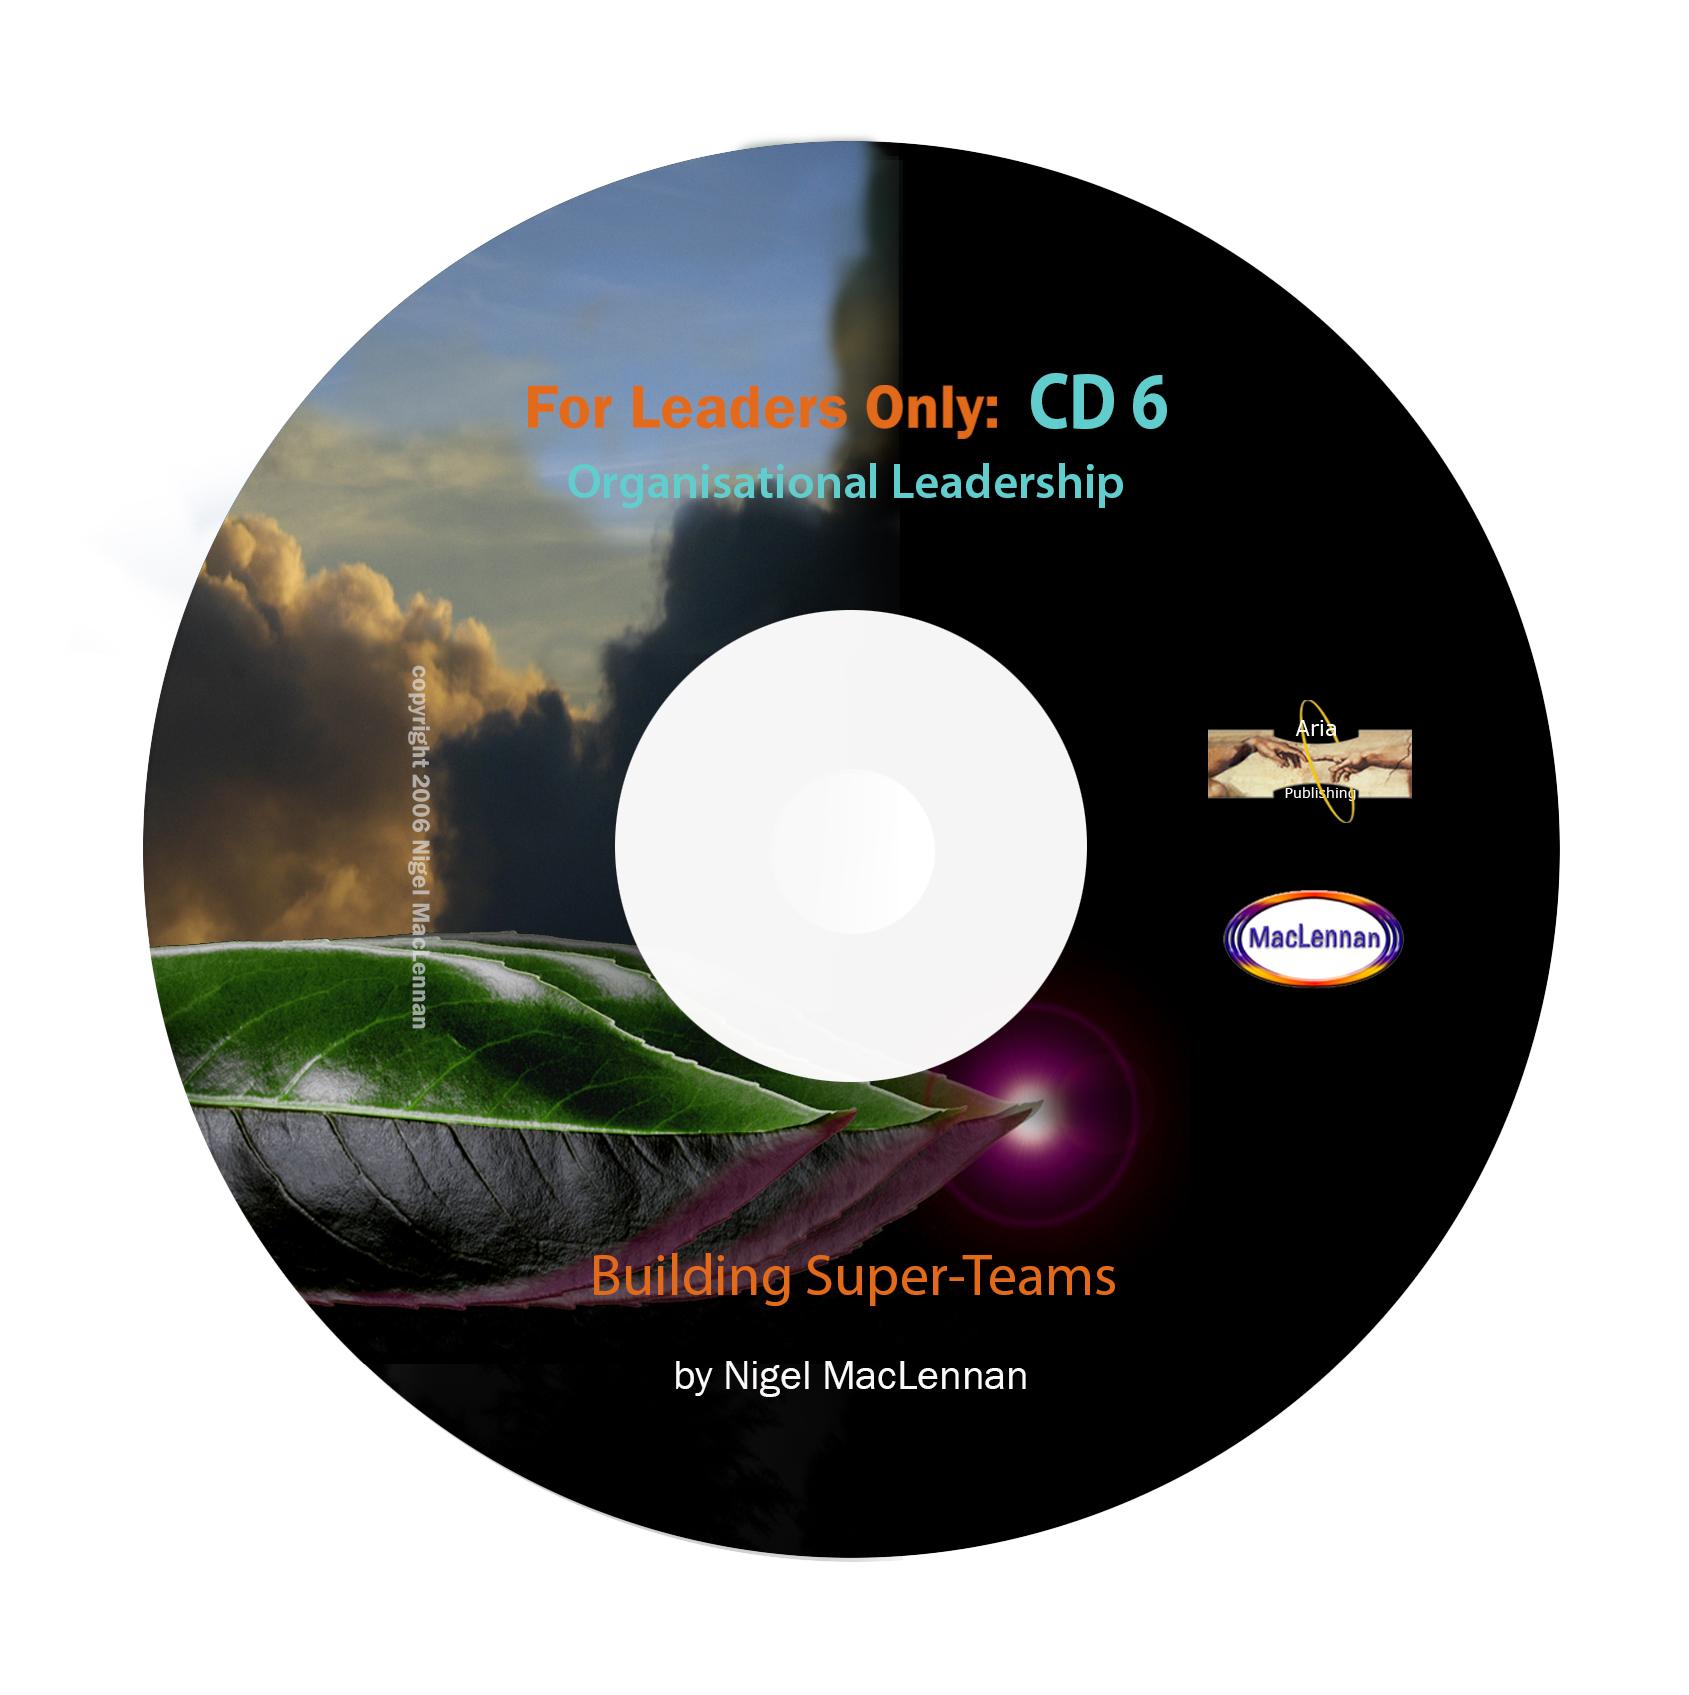 For Leaders Only - Building Superteams CD